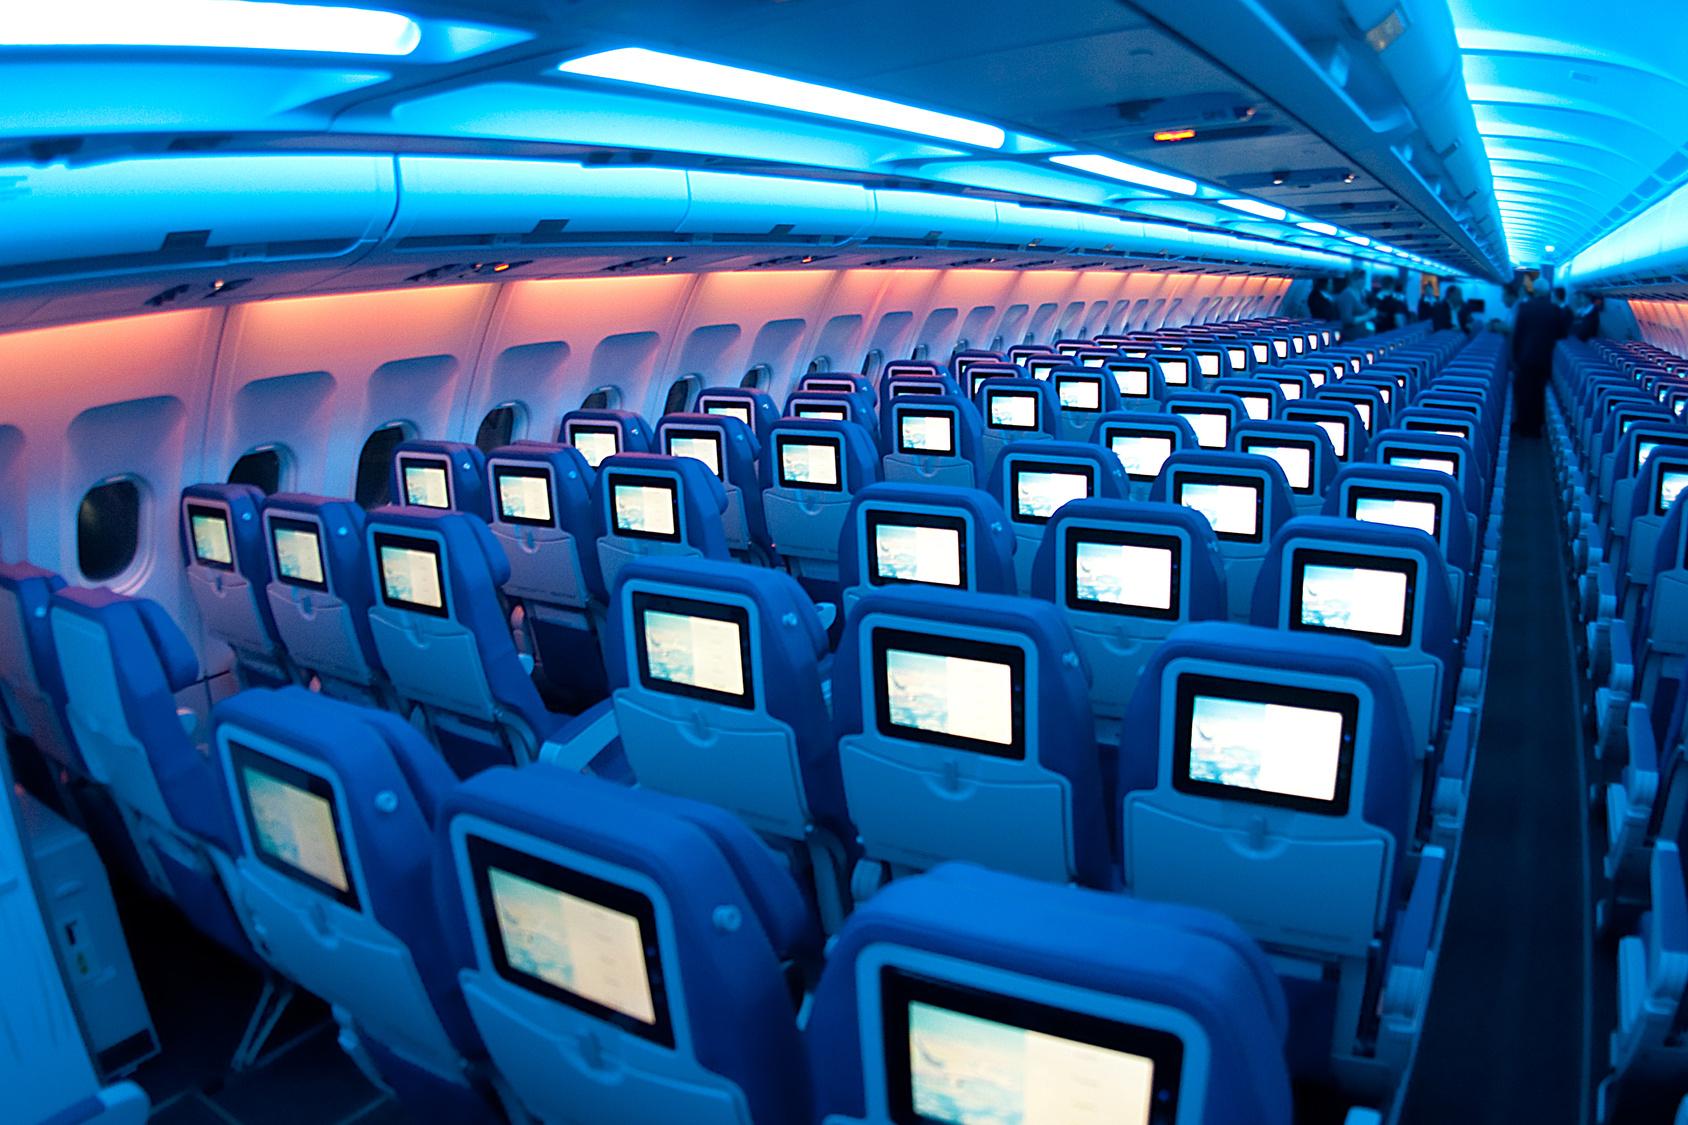 Interior of a passenger jet